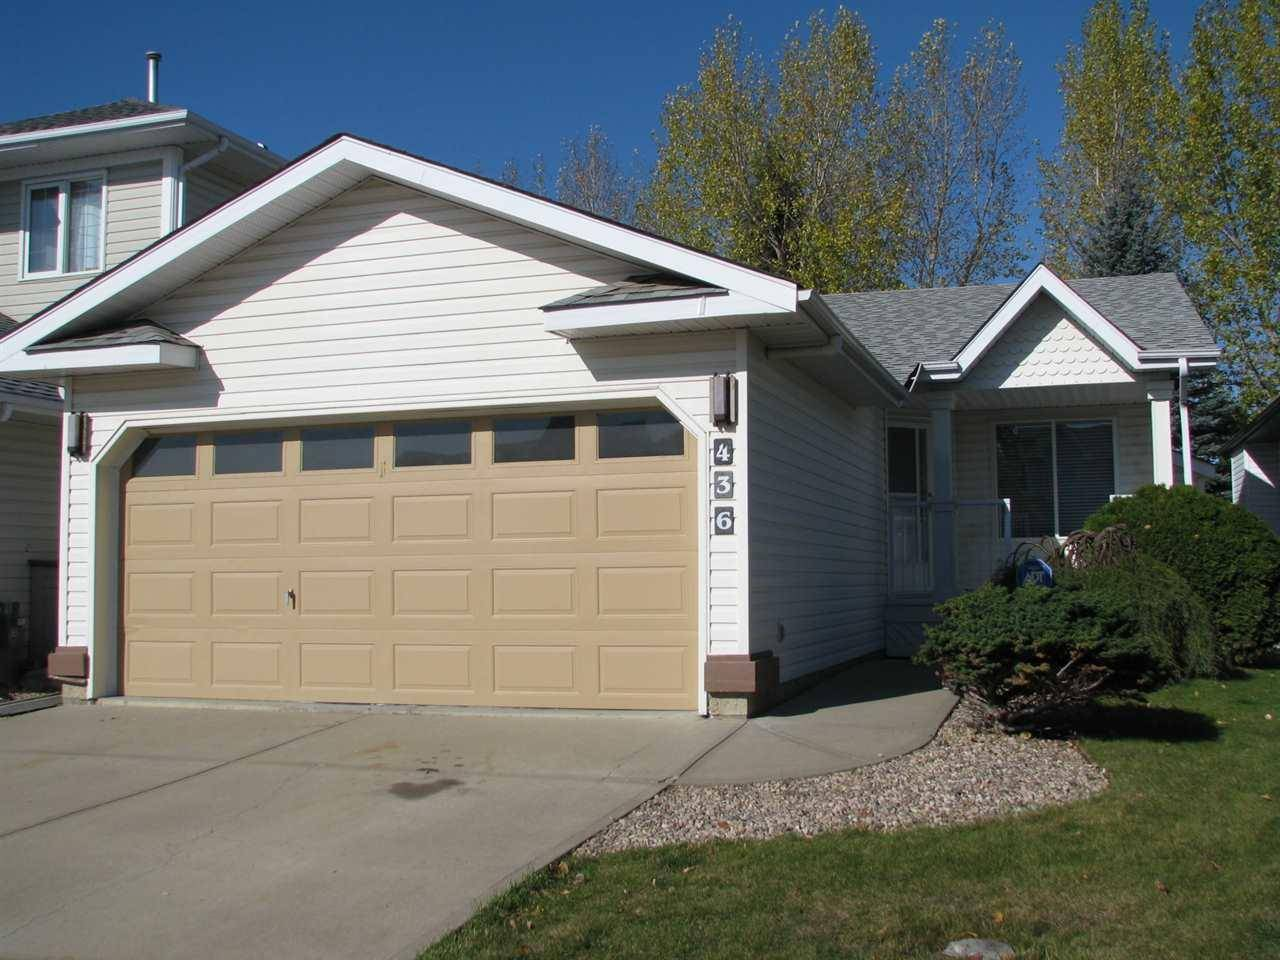 House for sale at 436 Breckenridge Ln Nw Edmonton Alberta - MLS: E4176059